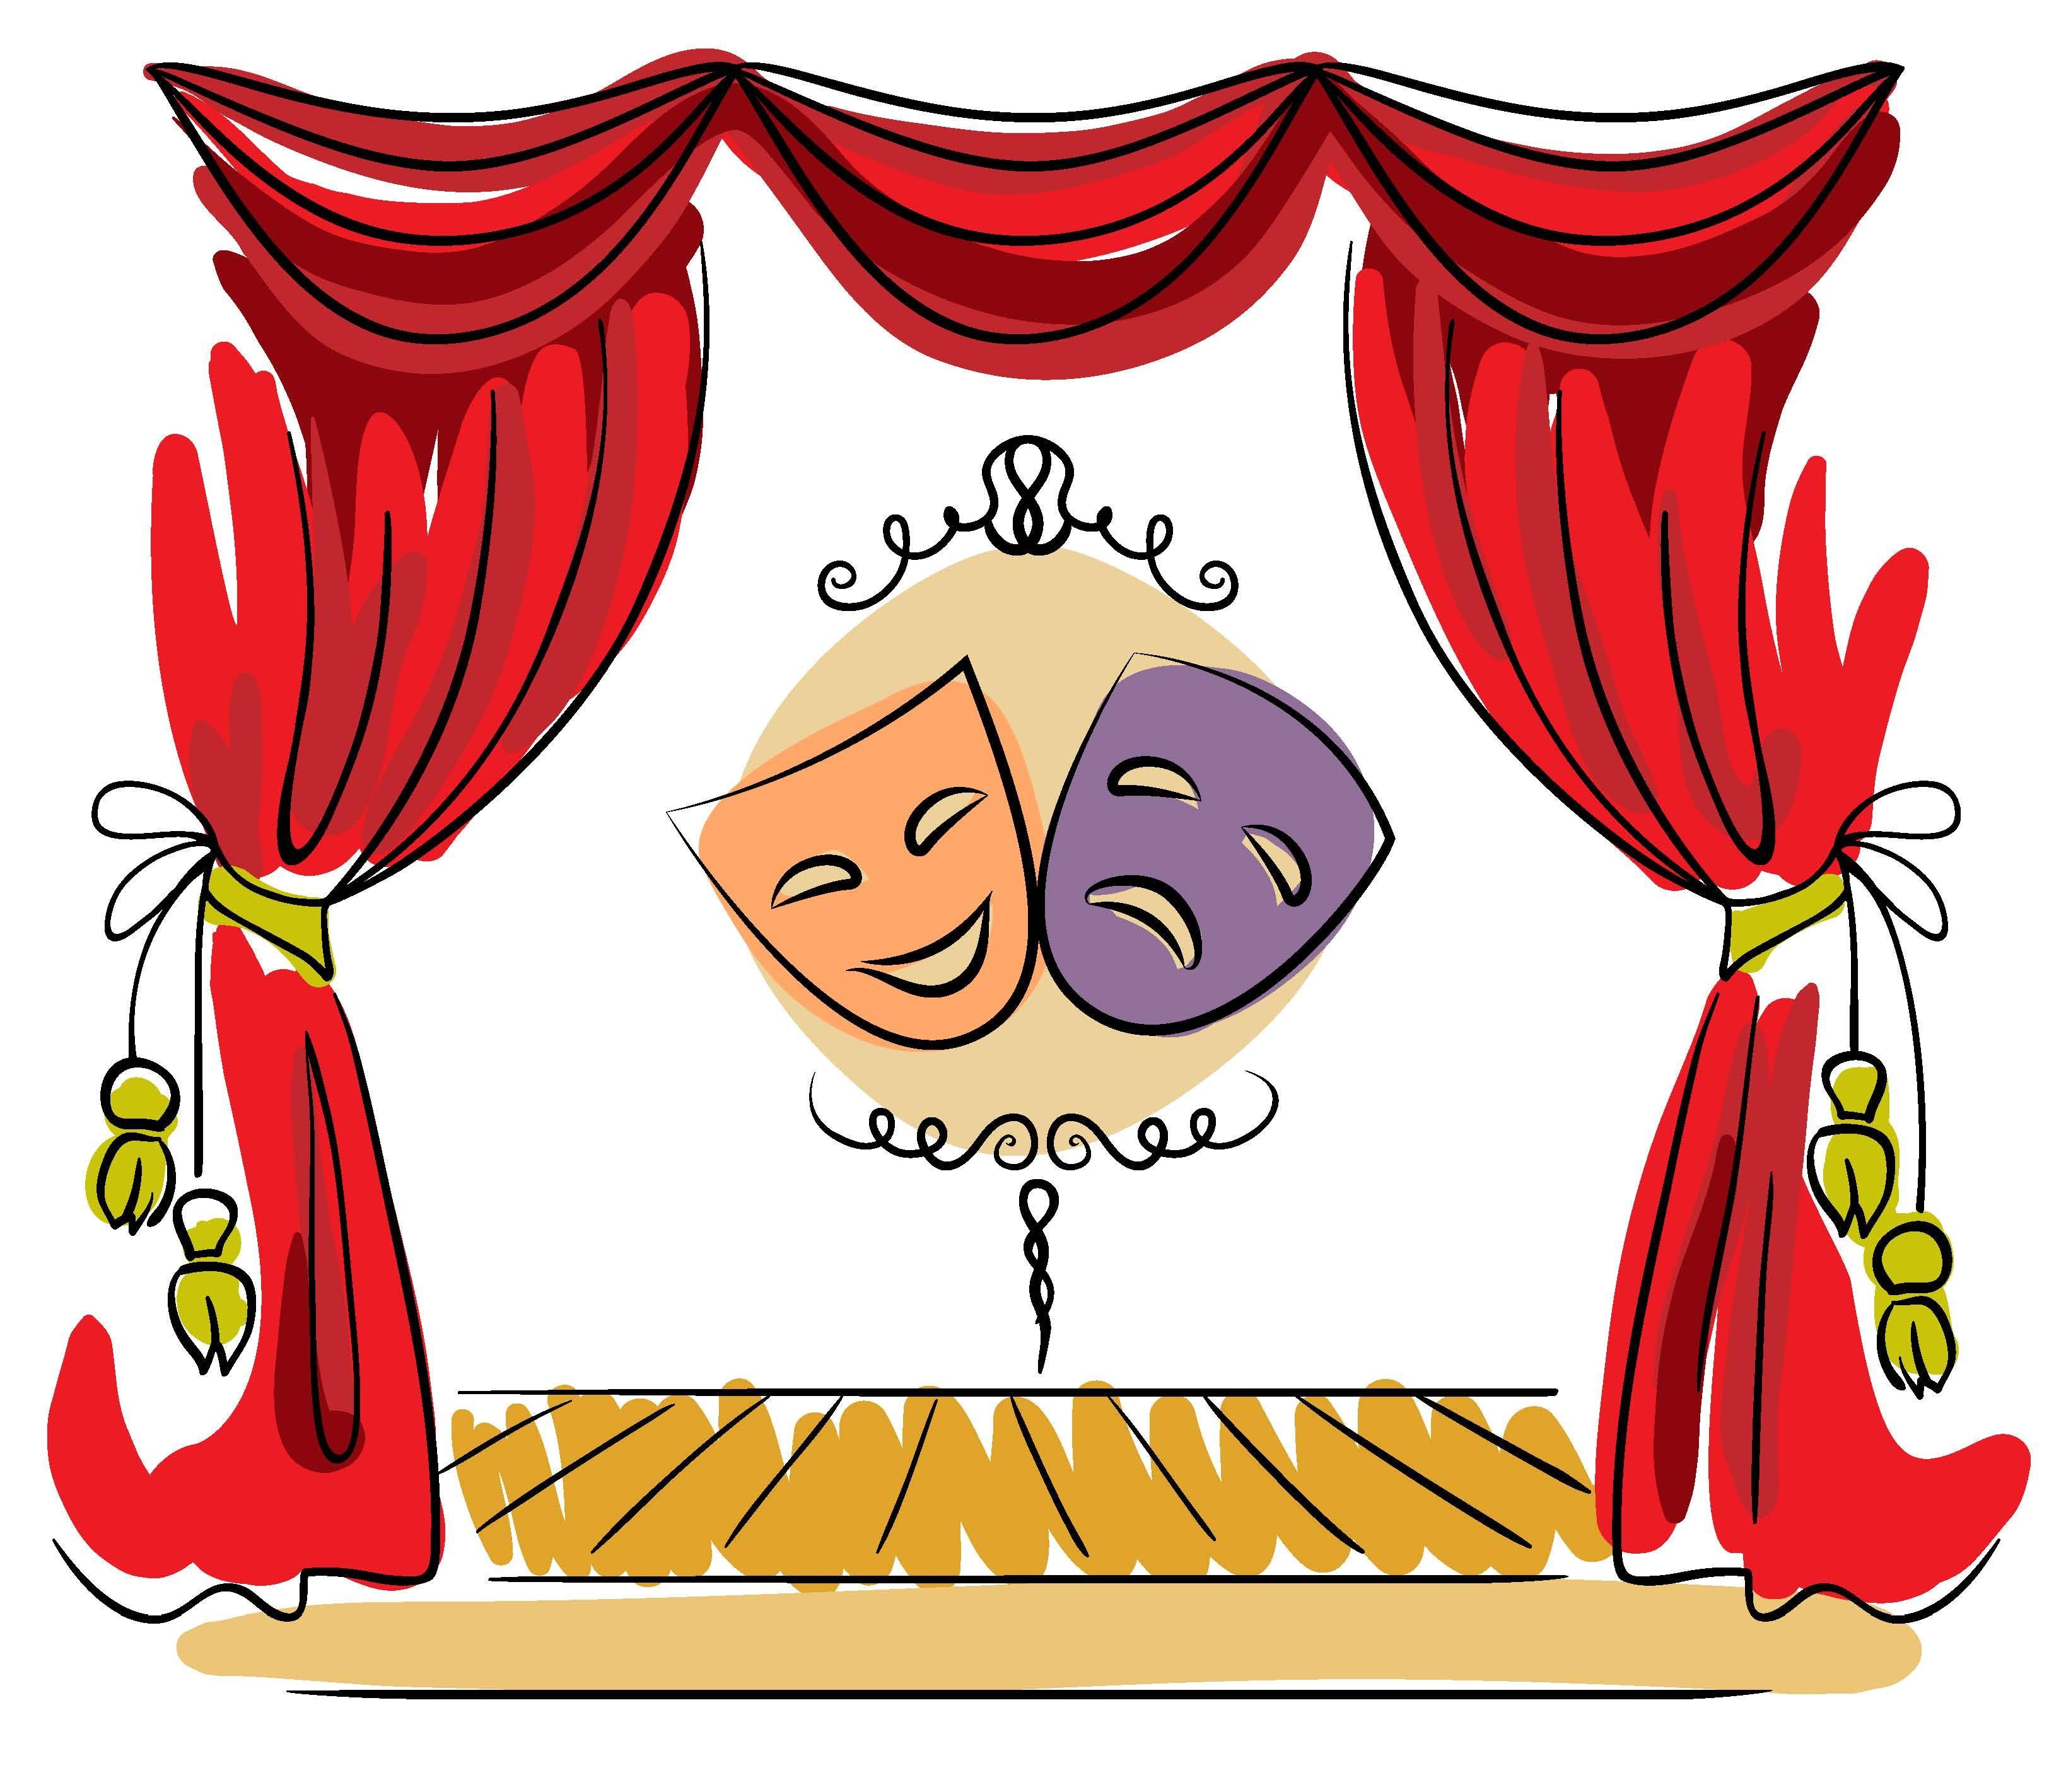 Theatre clipart childrens theater, Theatre childrens theater.